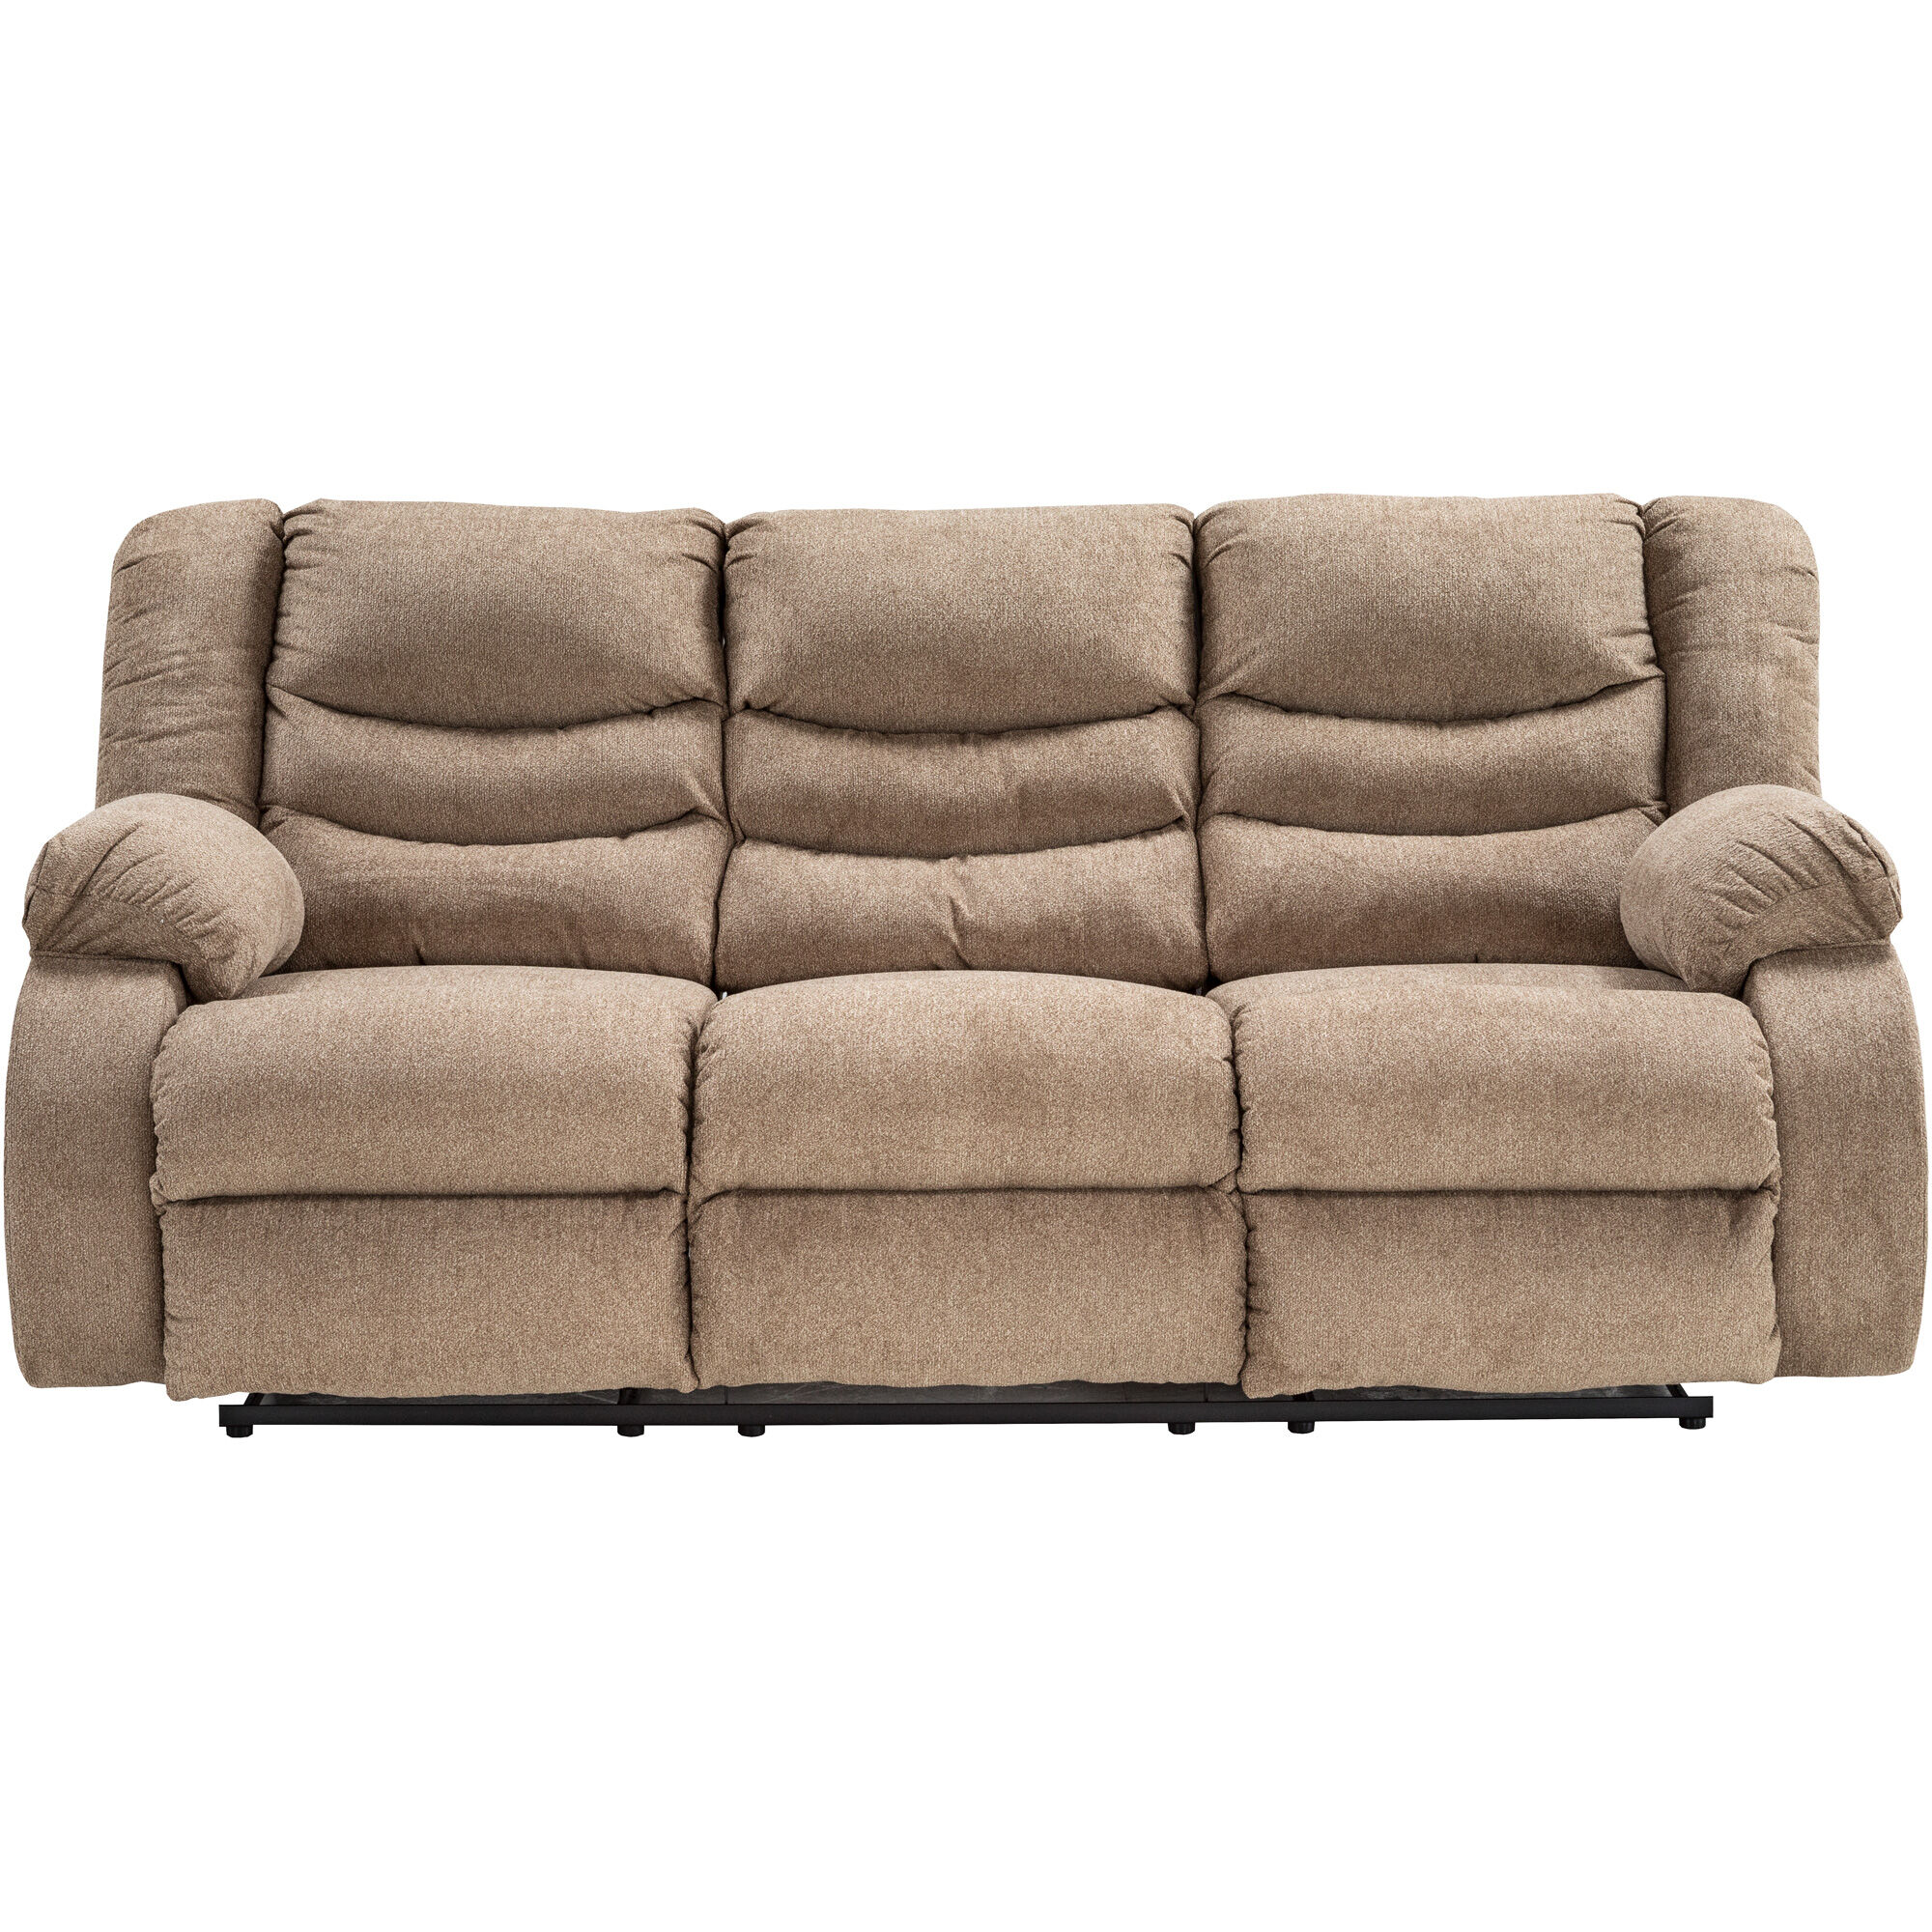 Kent Mocha Reclining Sofa; Kent Mocha Reclining Sofa ...